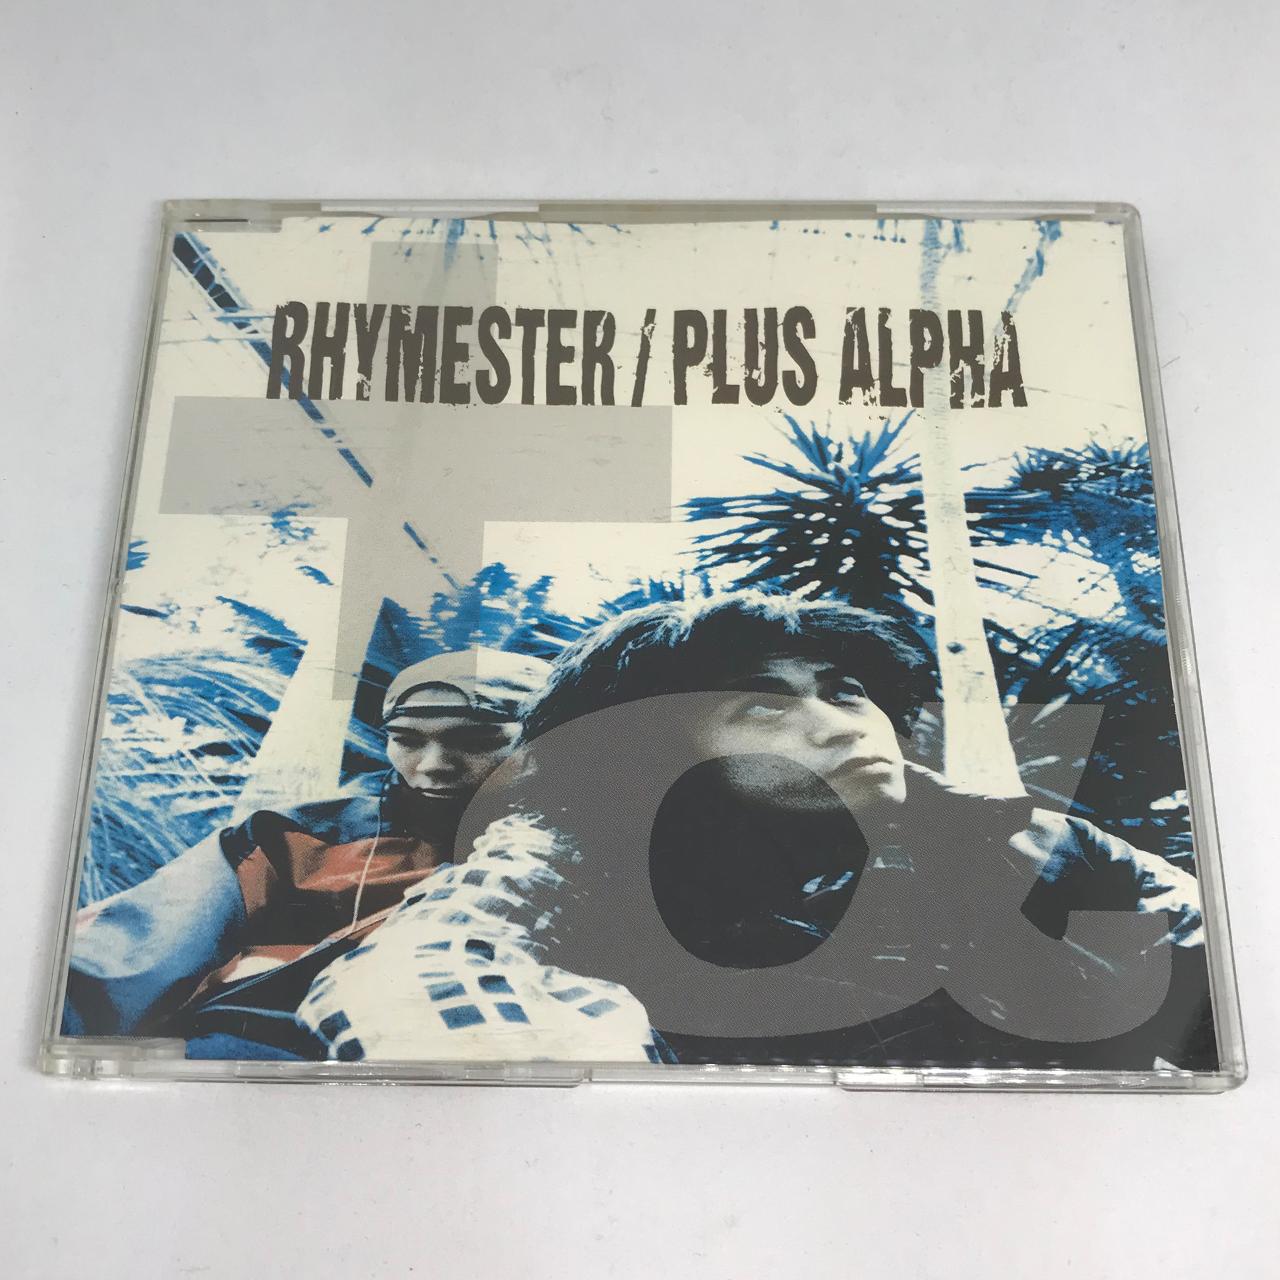 RHYMESTER / PLUS ALPHA